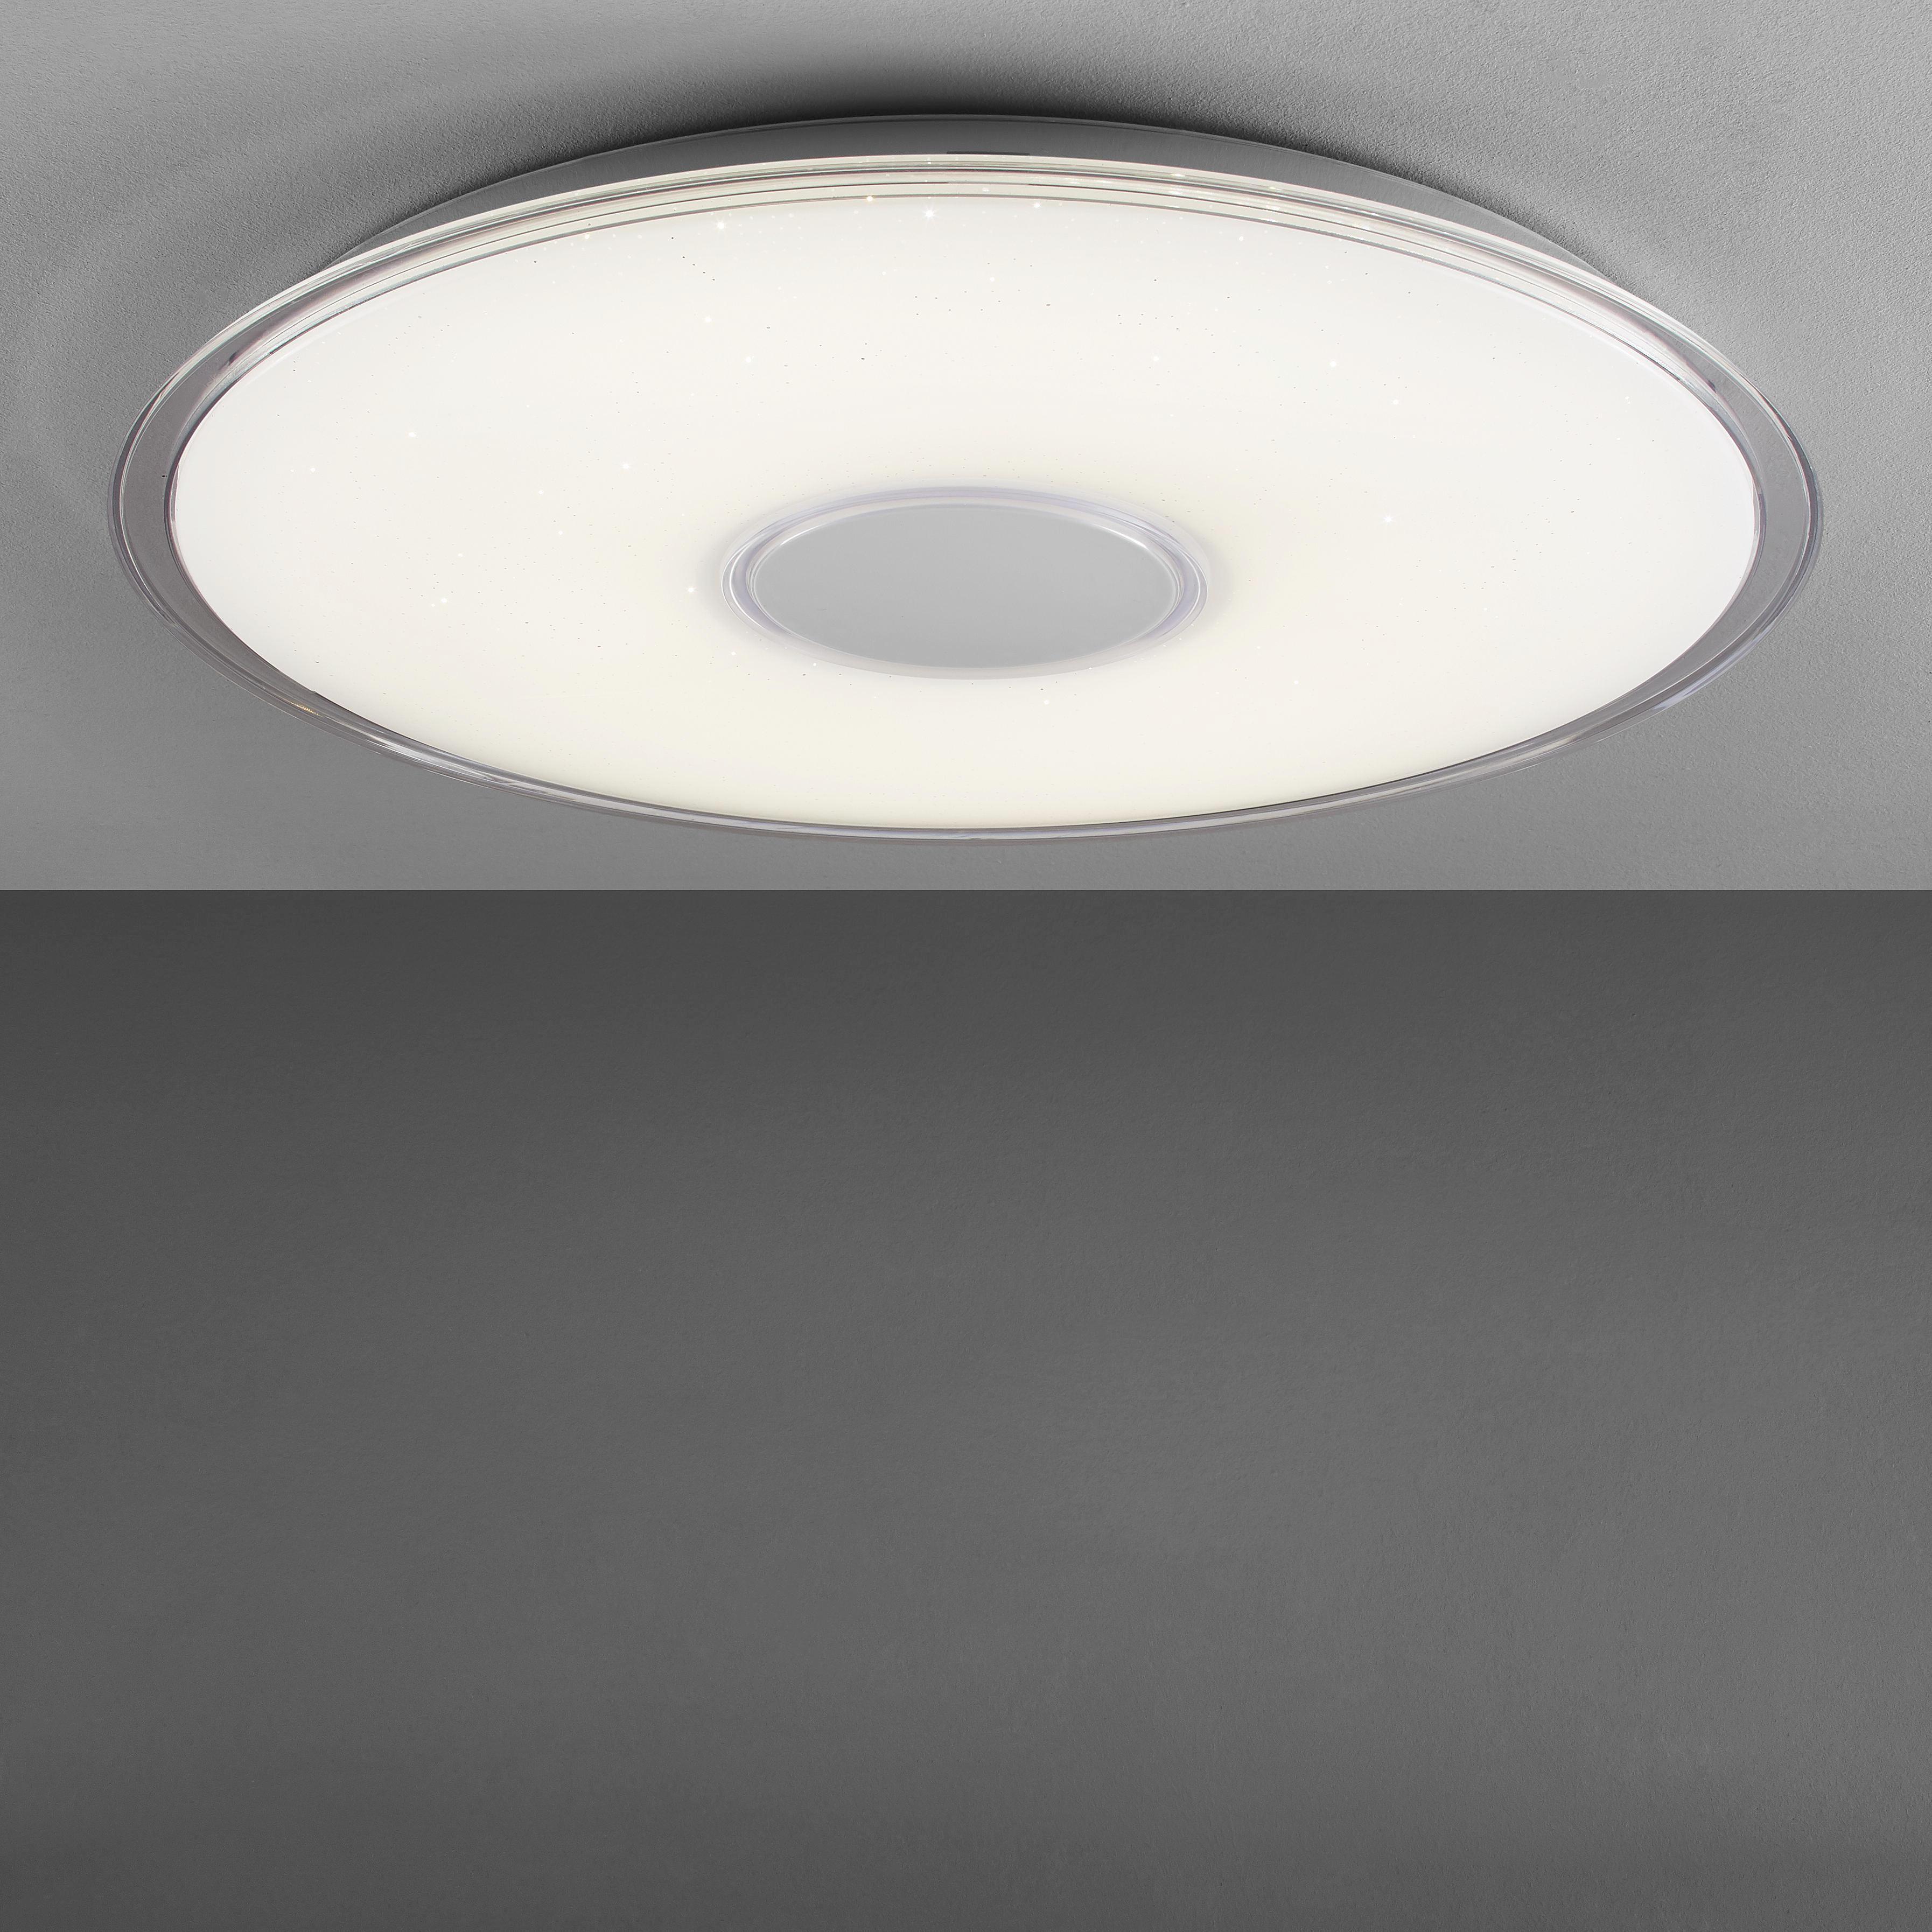 LED-DECKENLEUCHTE - Weiß, KONVENTIONELL, Kunststoff (60/6,5cm) - NOVEL